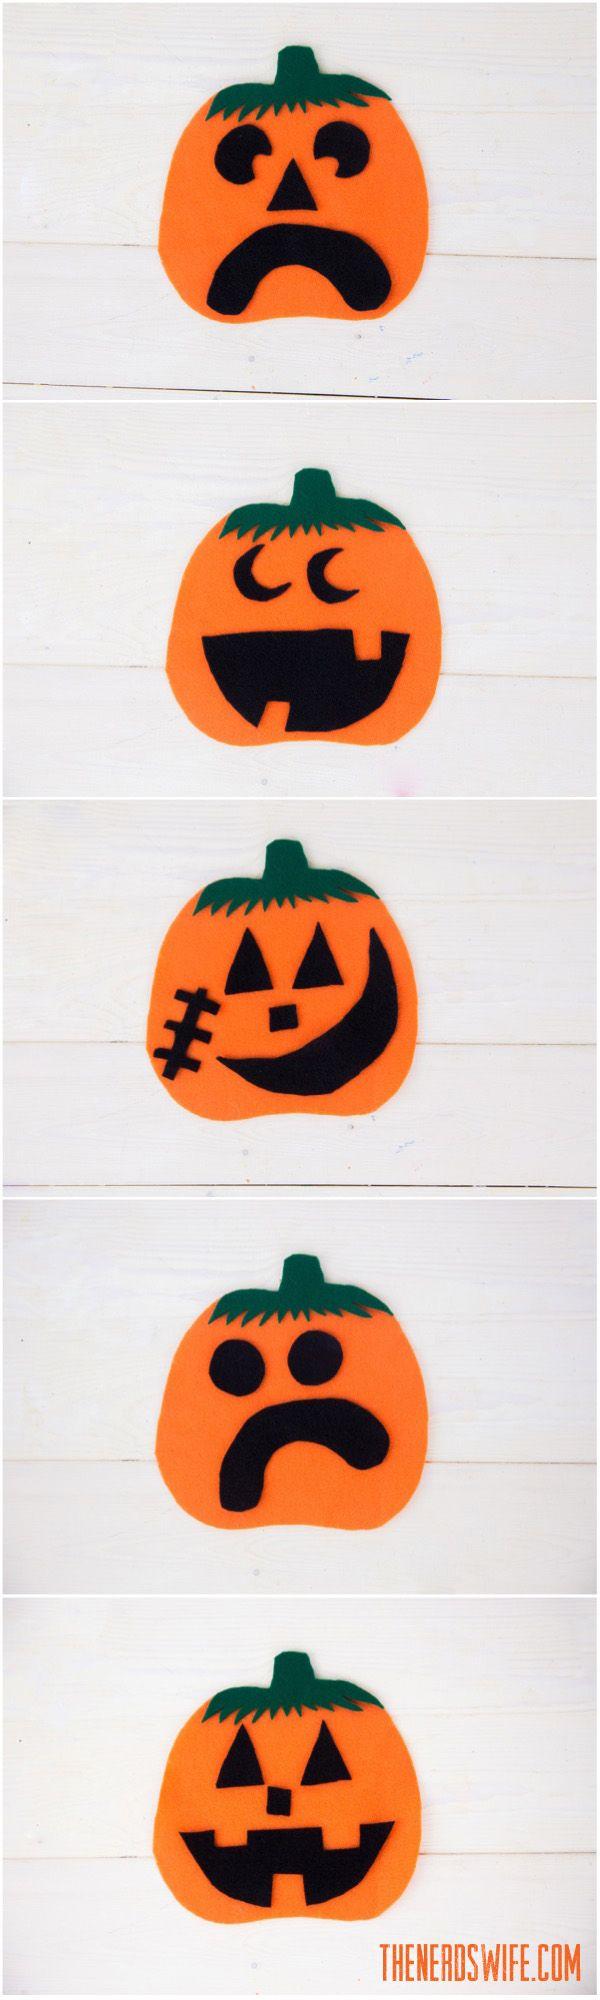 Felt Pumpkin Preschool Craft Preschool Crafts Pumpkin Crafts Preschool Pumpkins Preschool